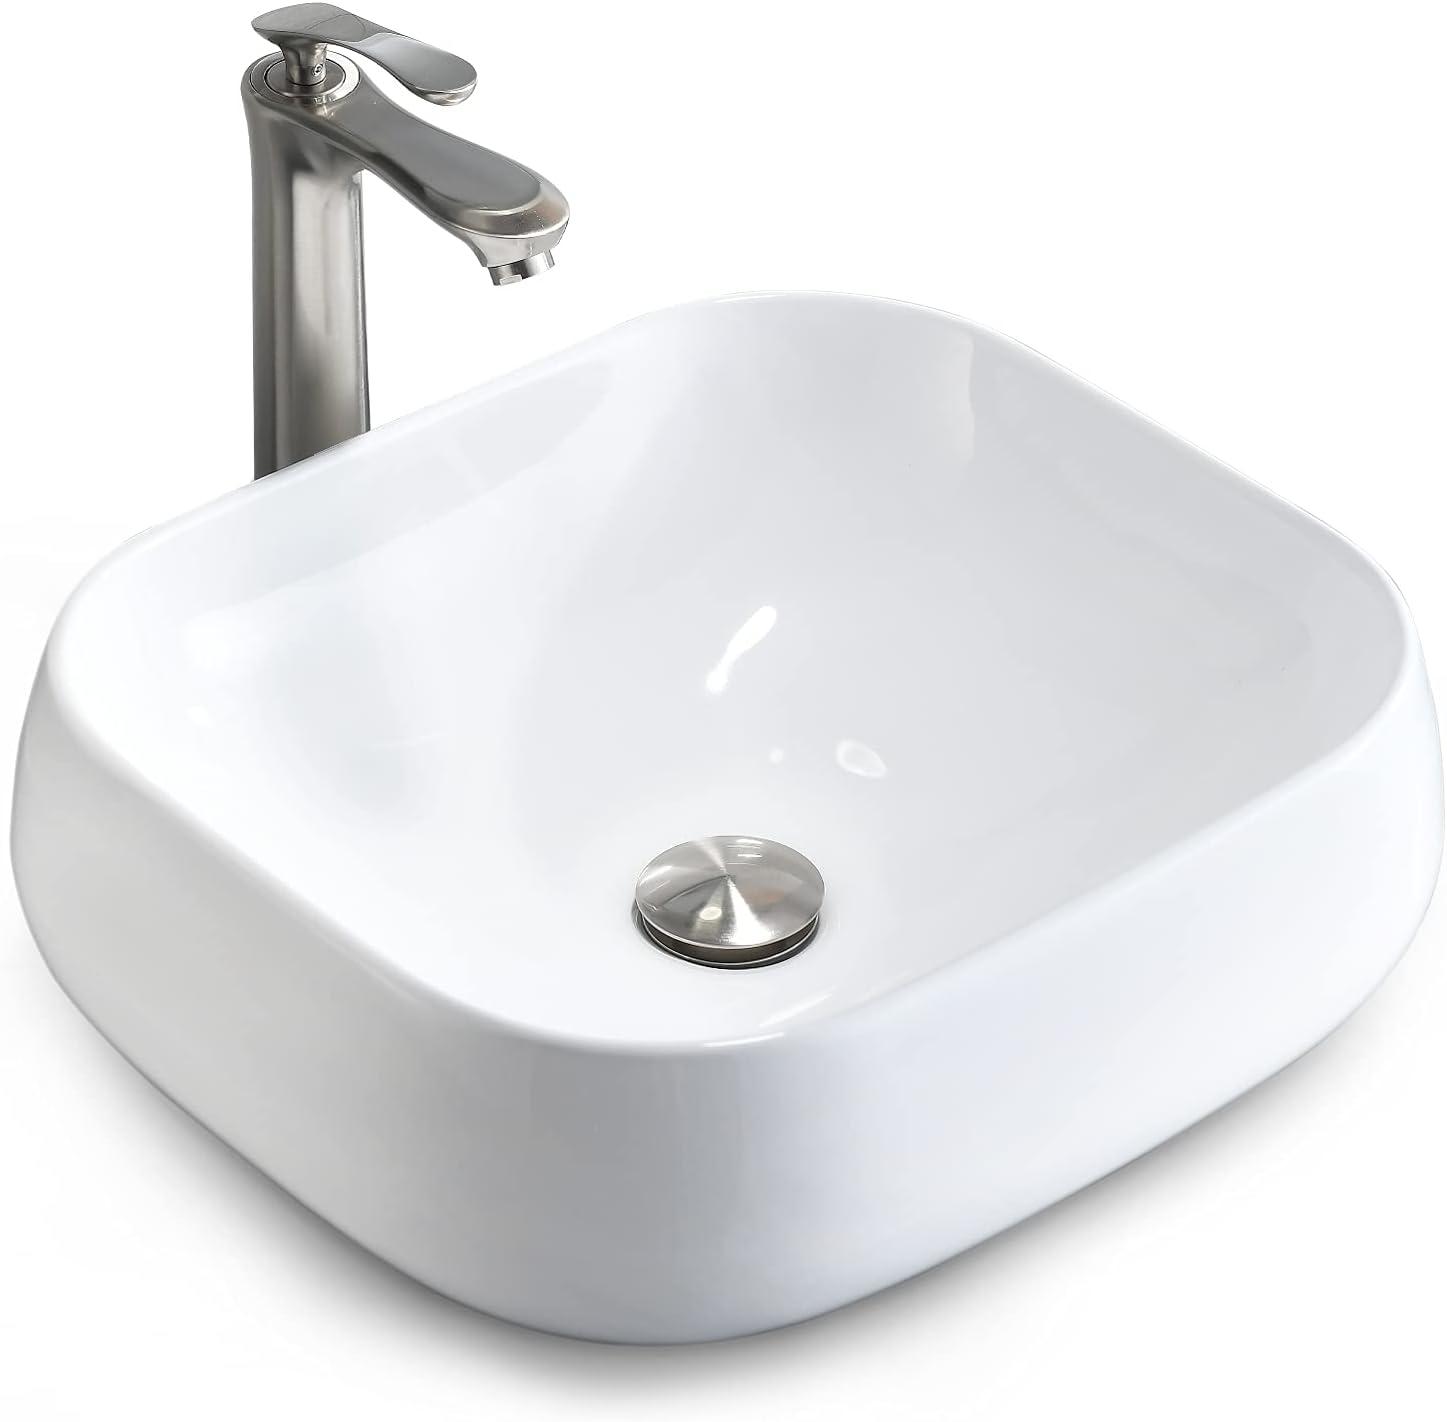 Bathroom 永遠の定番モデル Lavatory Vanity Vessel Sink BoomHoze Above Por Counter ファクトリーアウトレット